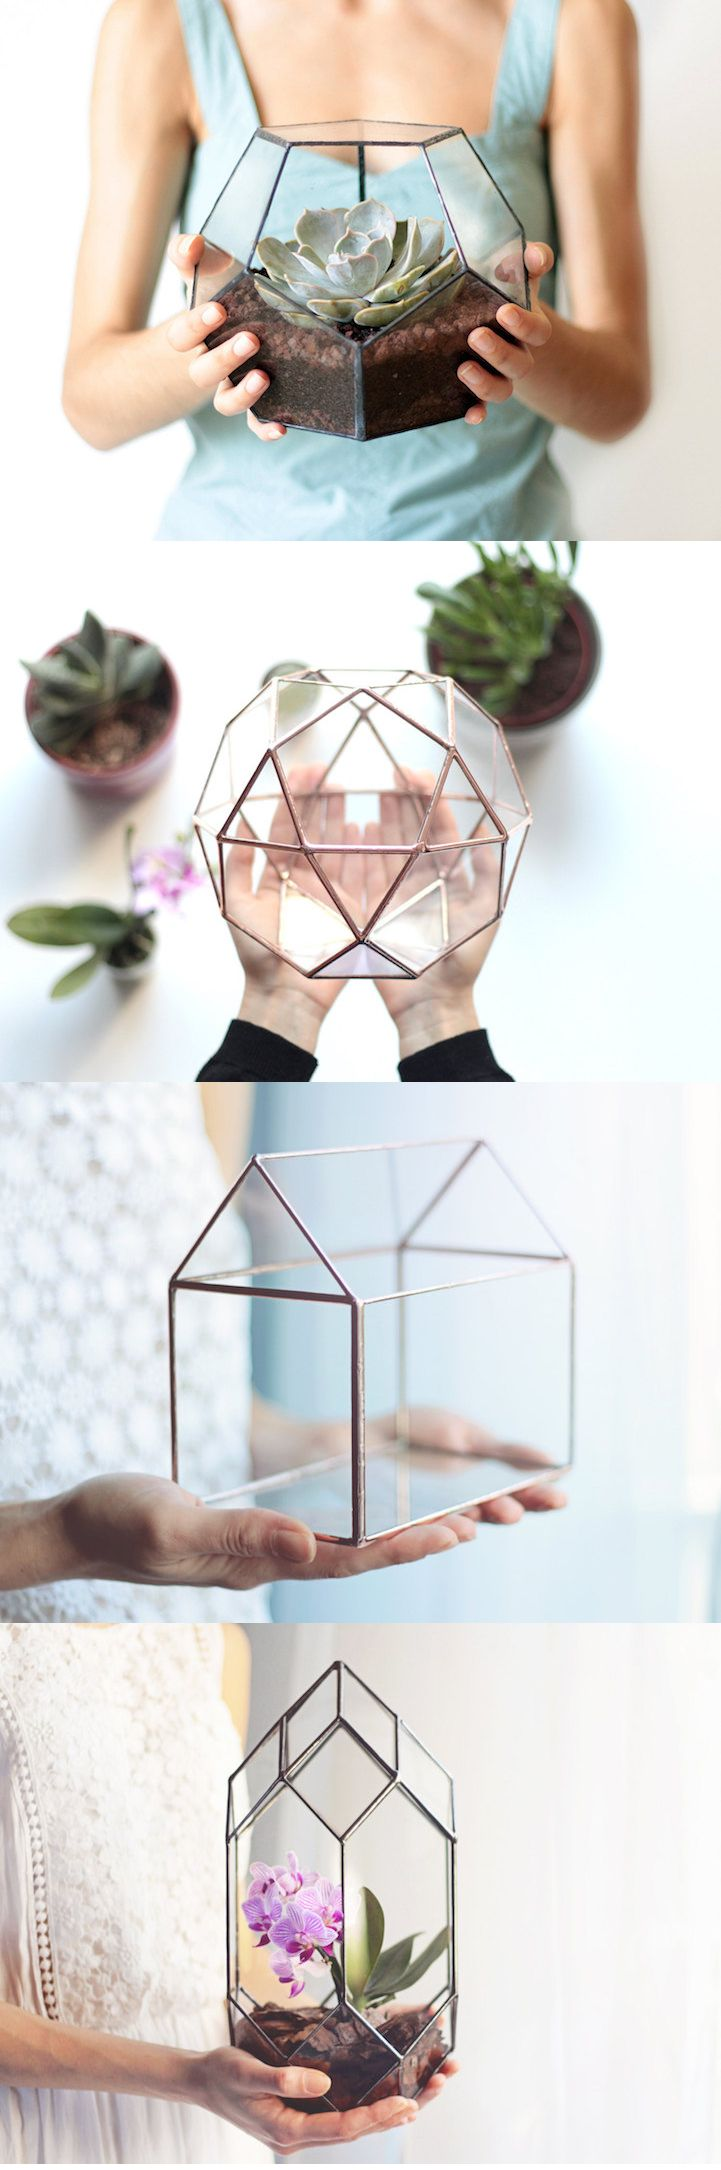 Large Geometric Glass Terrarium / Icosidodecahedron / Globe Terrarium /  Handmade Glass Planter / Stained Glass Terrarium | Glass Terrarium,  Terraria And ...